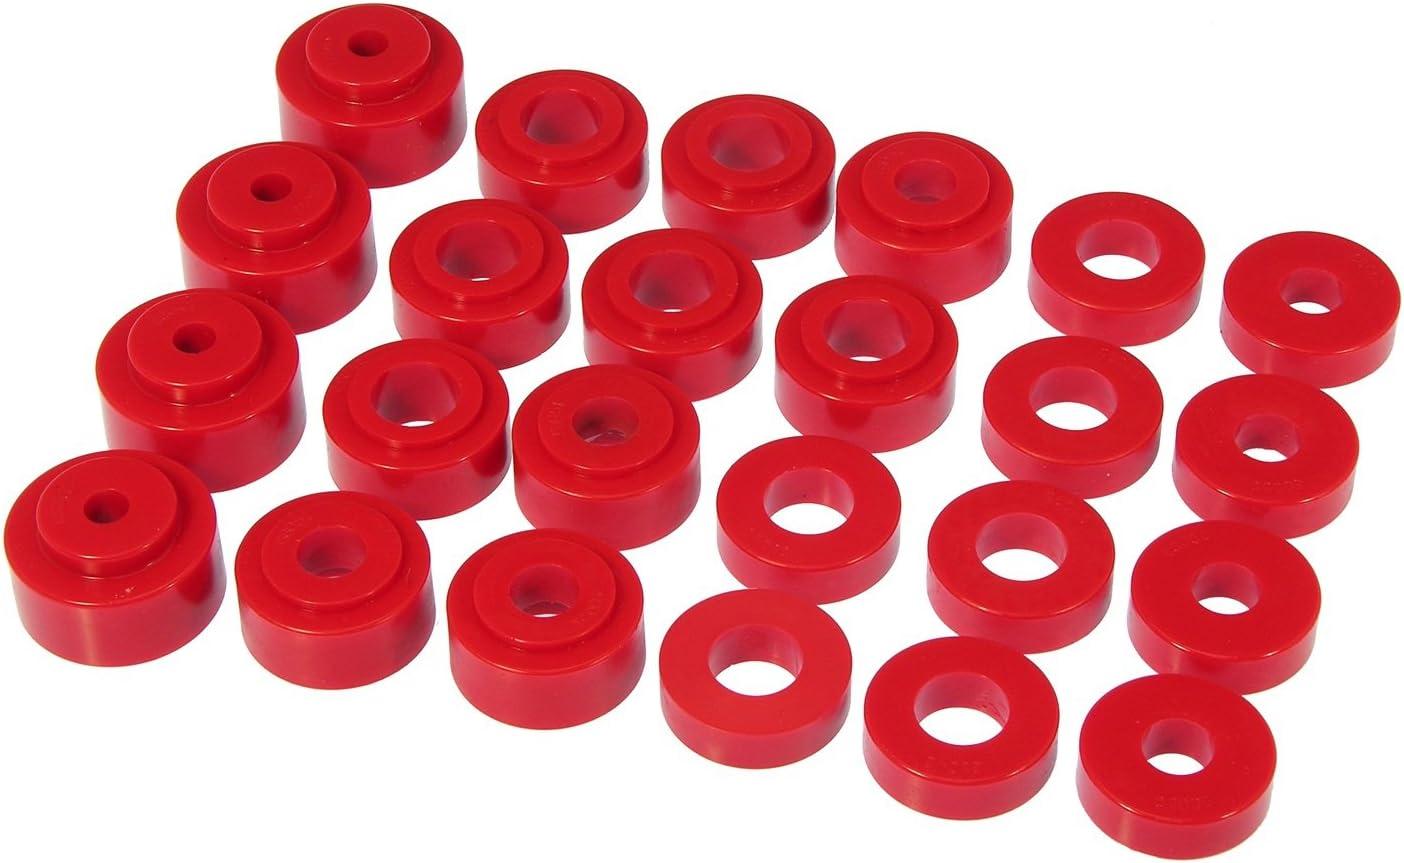 Prothane 7-125 Red Body Mount Kit